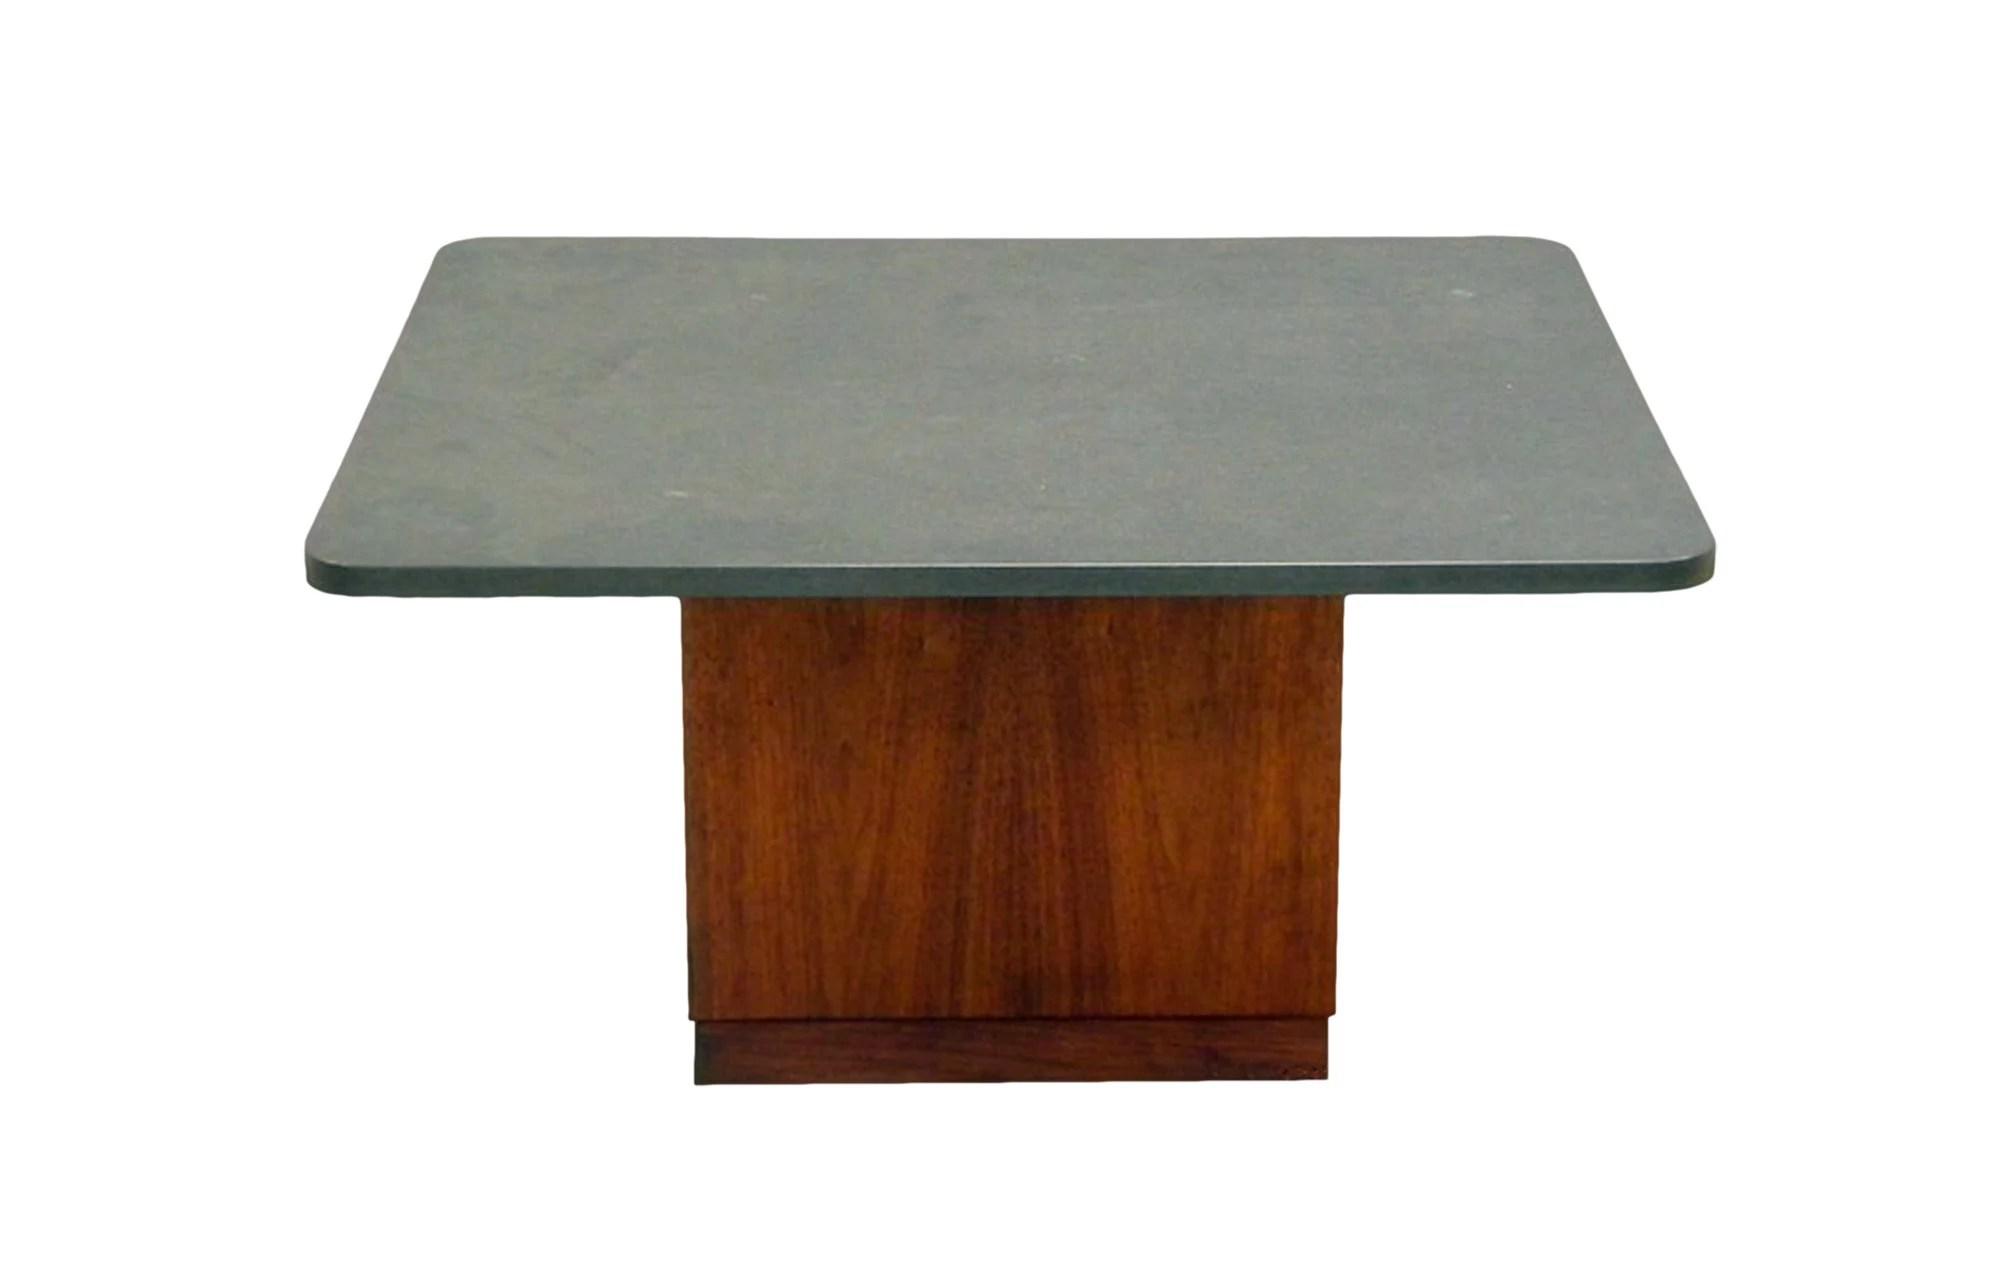 slate coffee table etsy